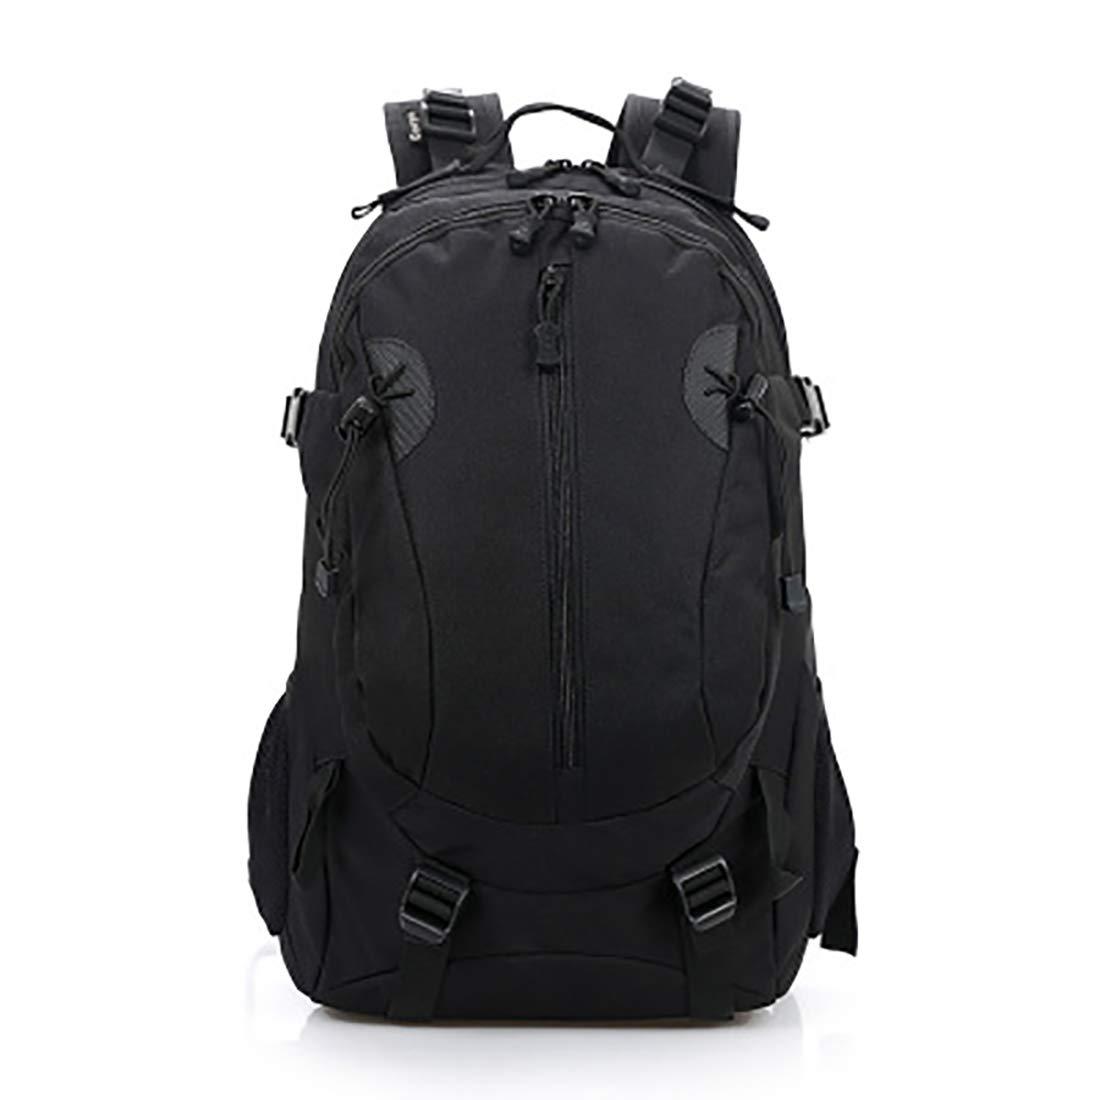 CAFUTY アウトドアスポーツキャンプハイキングランニング登山バッグ用カモフラージュショルダーバックパック (Color : ブラック)  ブラック B07N6GLNWK